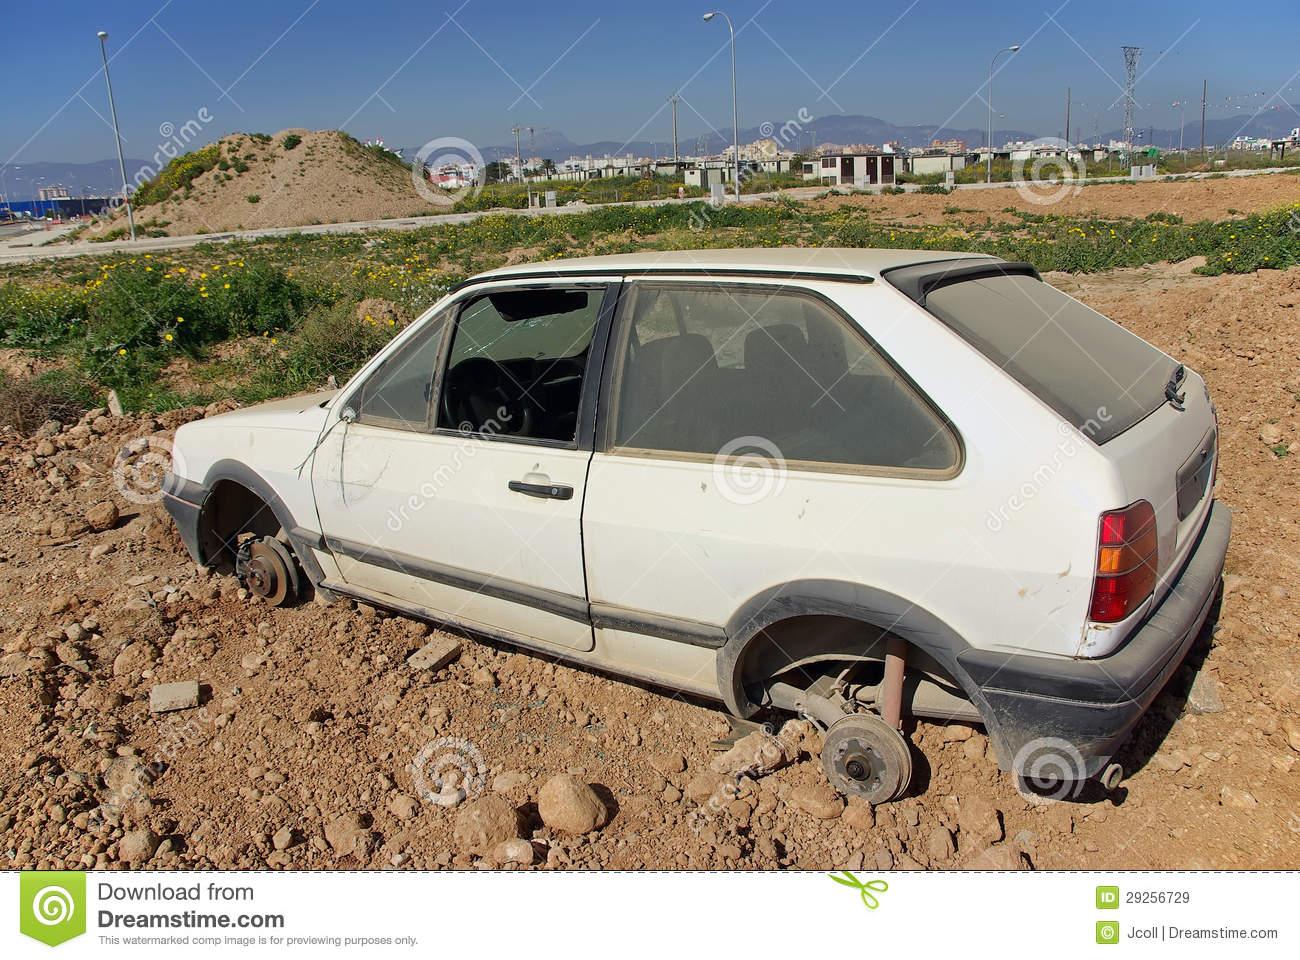 Stolen Car Clipart - Clipart Kid